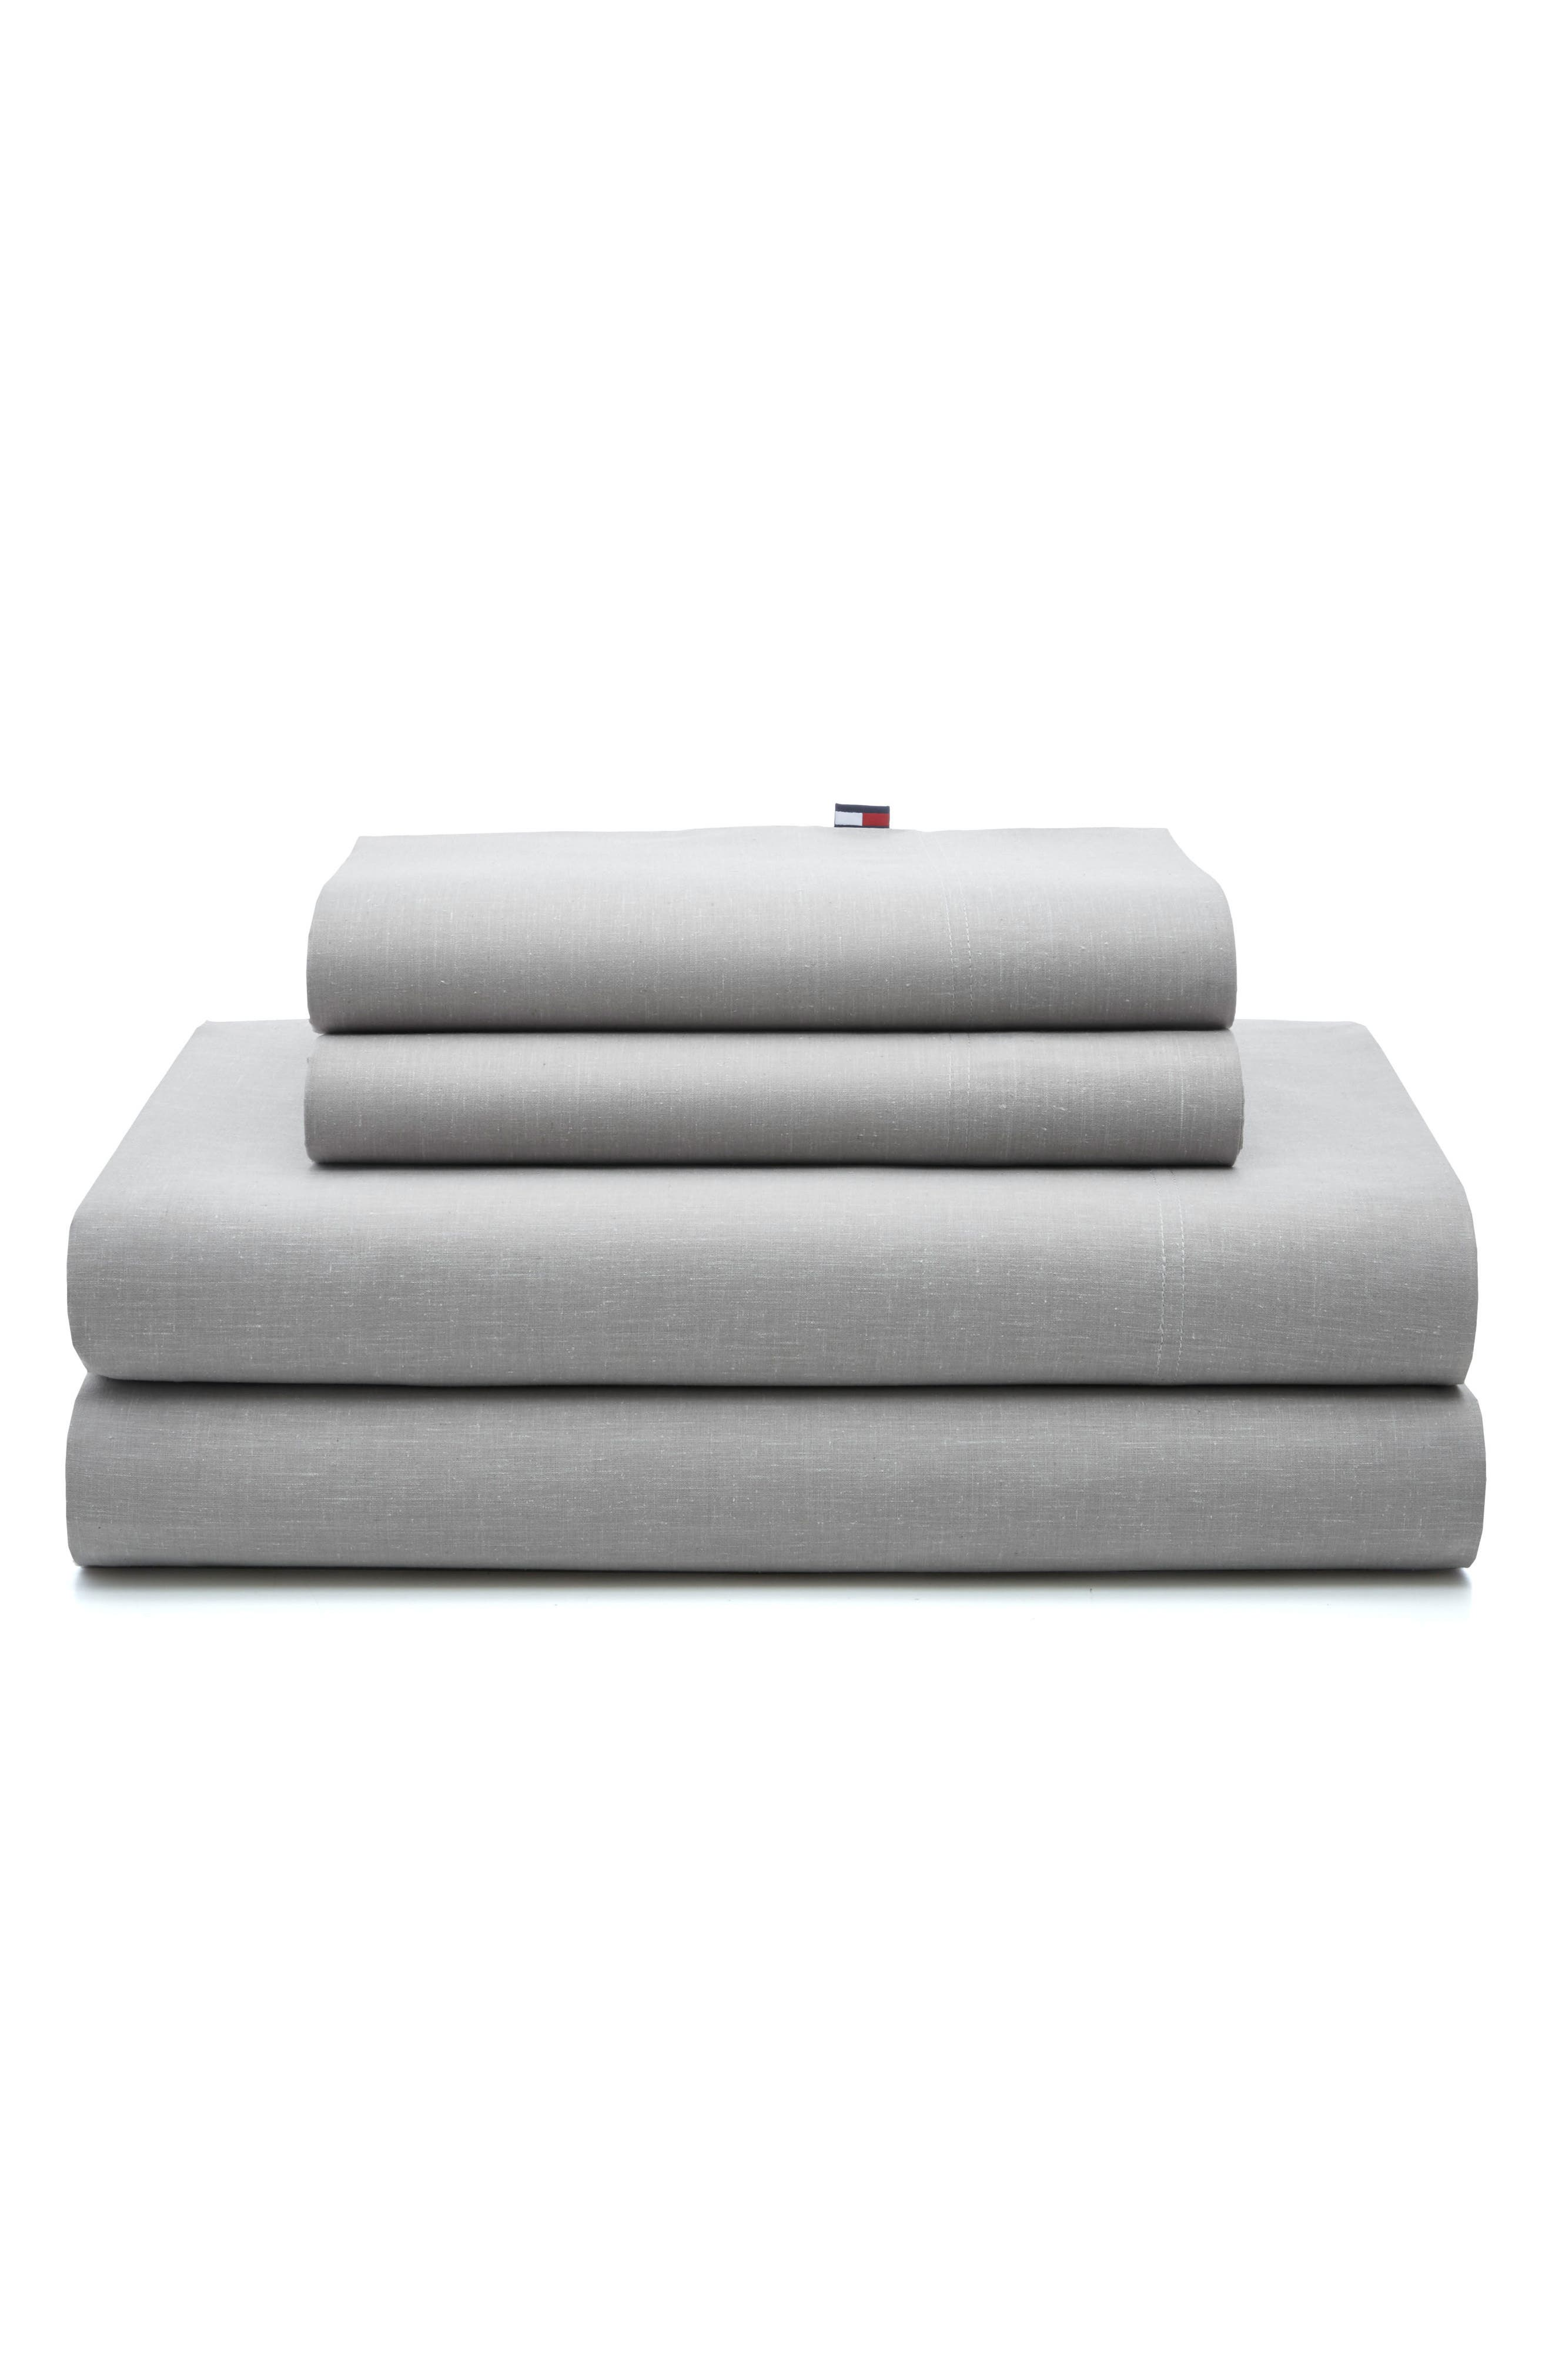 Chambray Pillowcases,                         Main,                         color, Light Grey